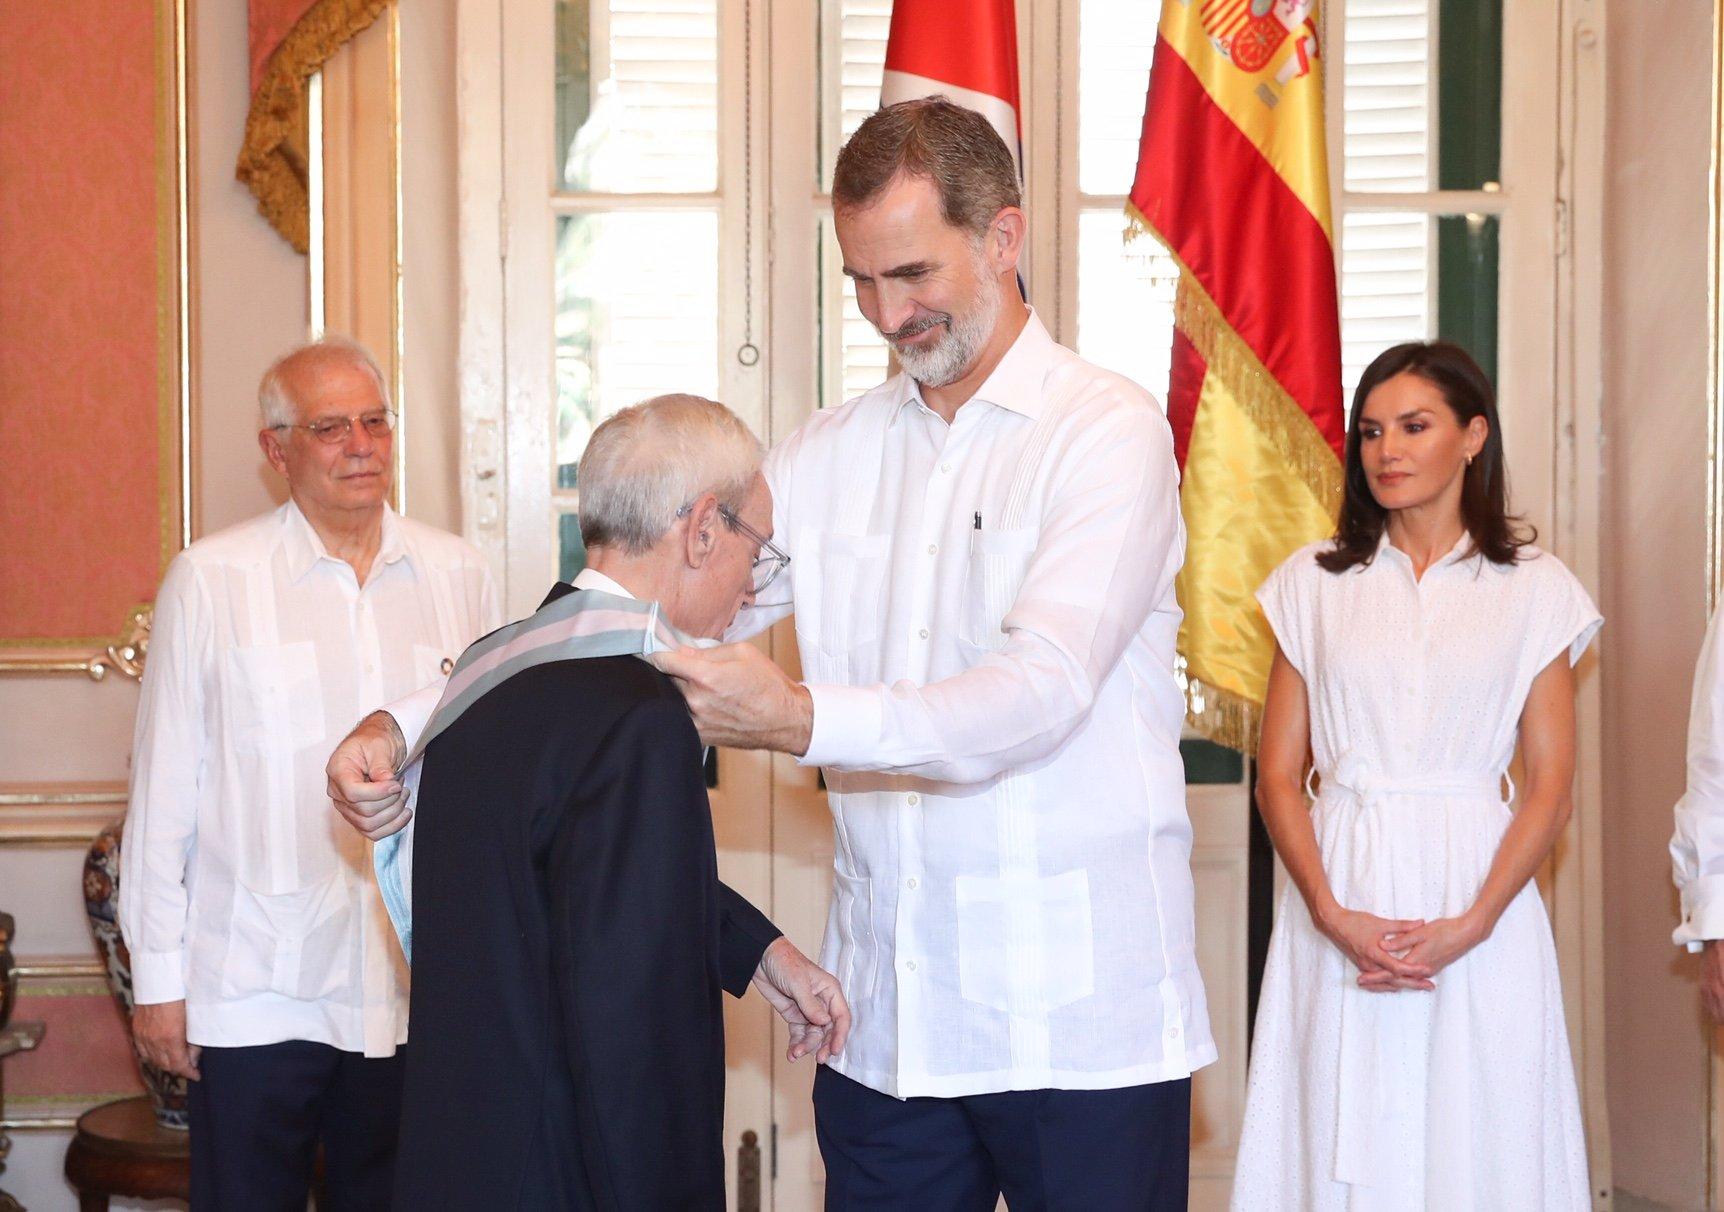 Spain honors Eusebio Leal